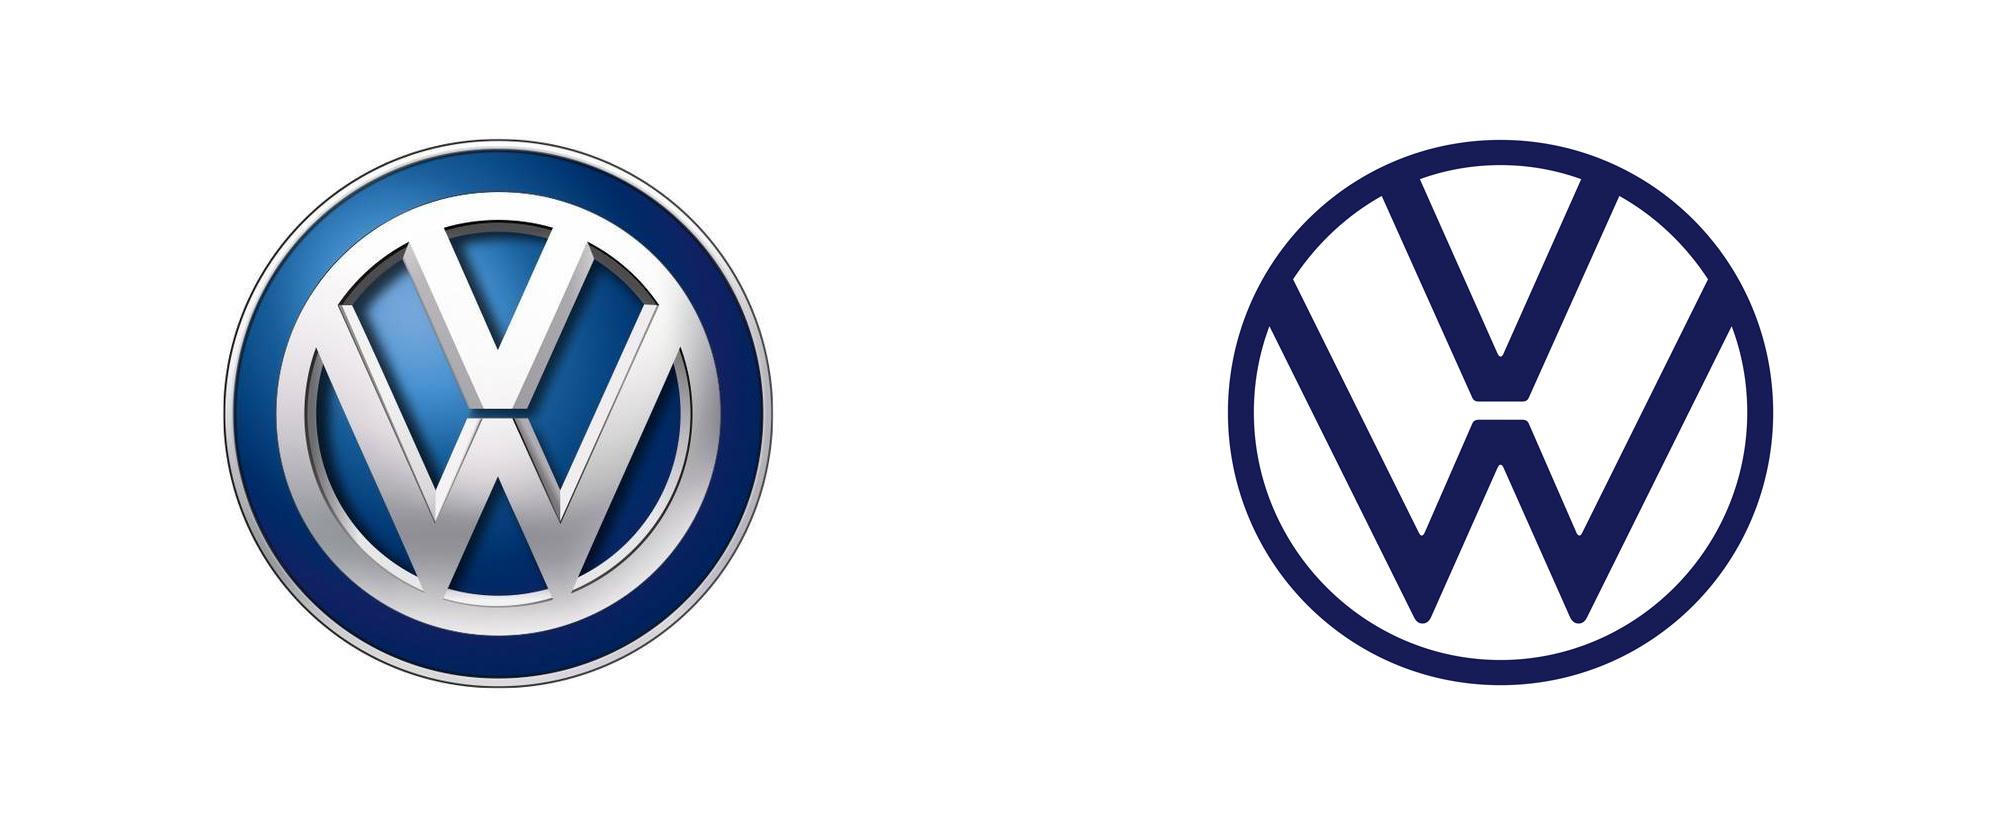 Изменение логотипа Volkswagen